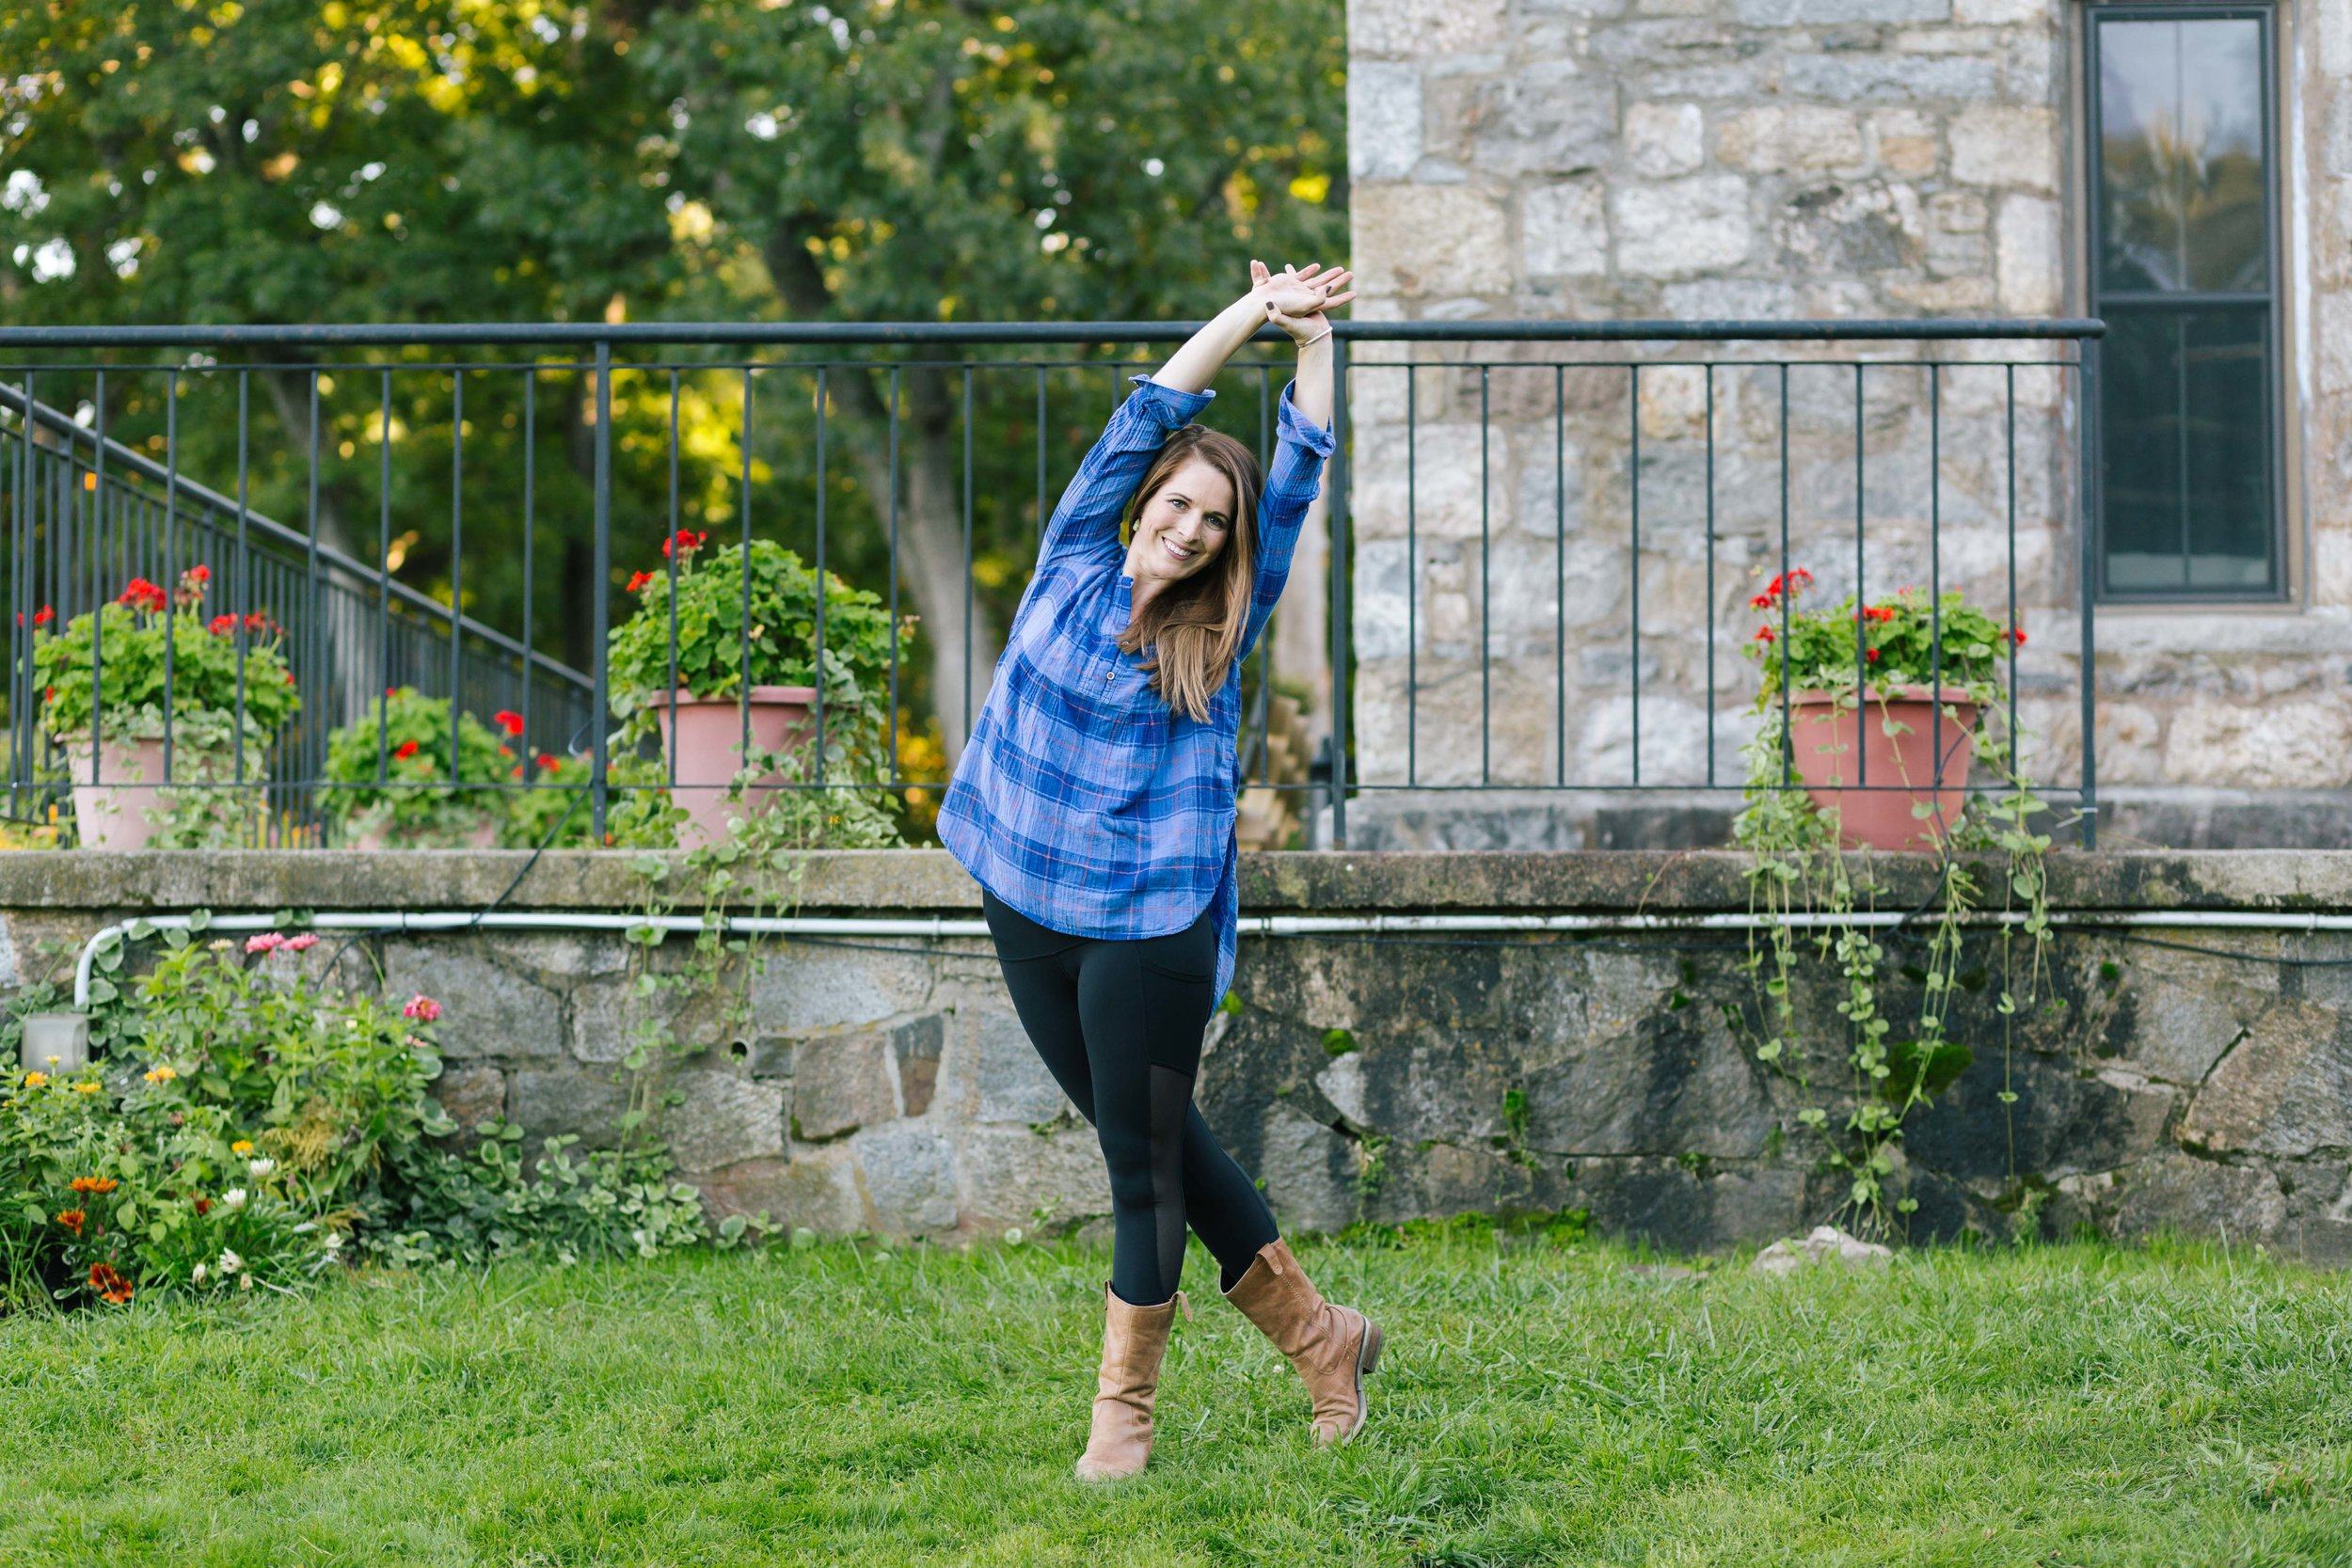 The beautiful Caroline Pineau, owner of The Yoga Tree in Haverhill, MA